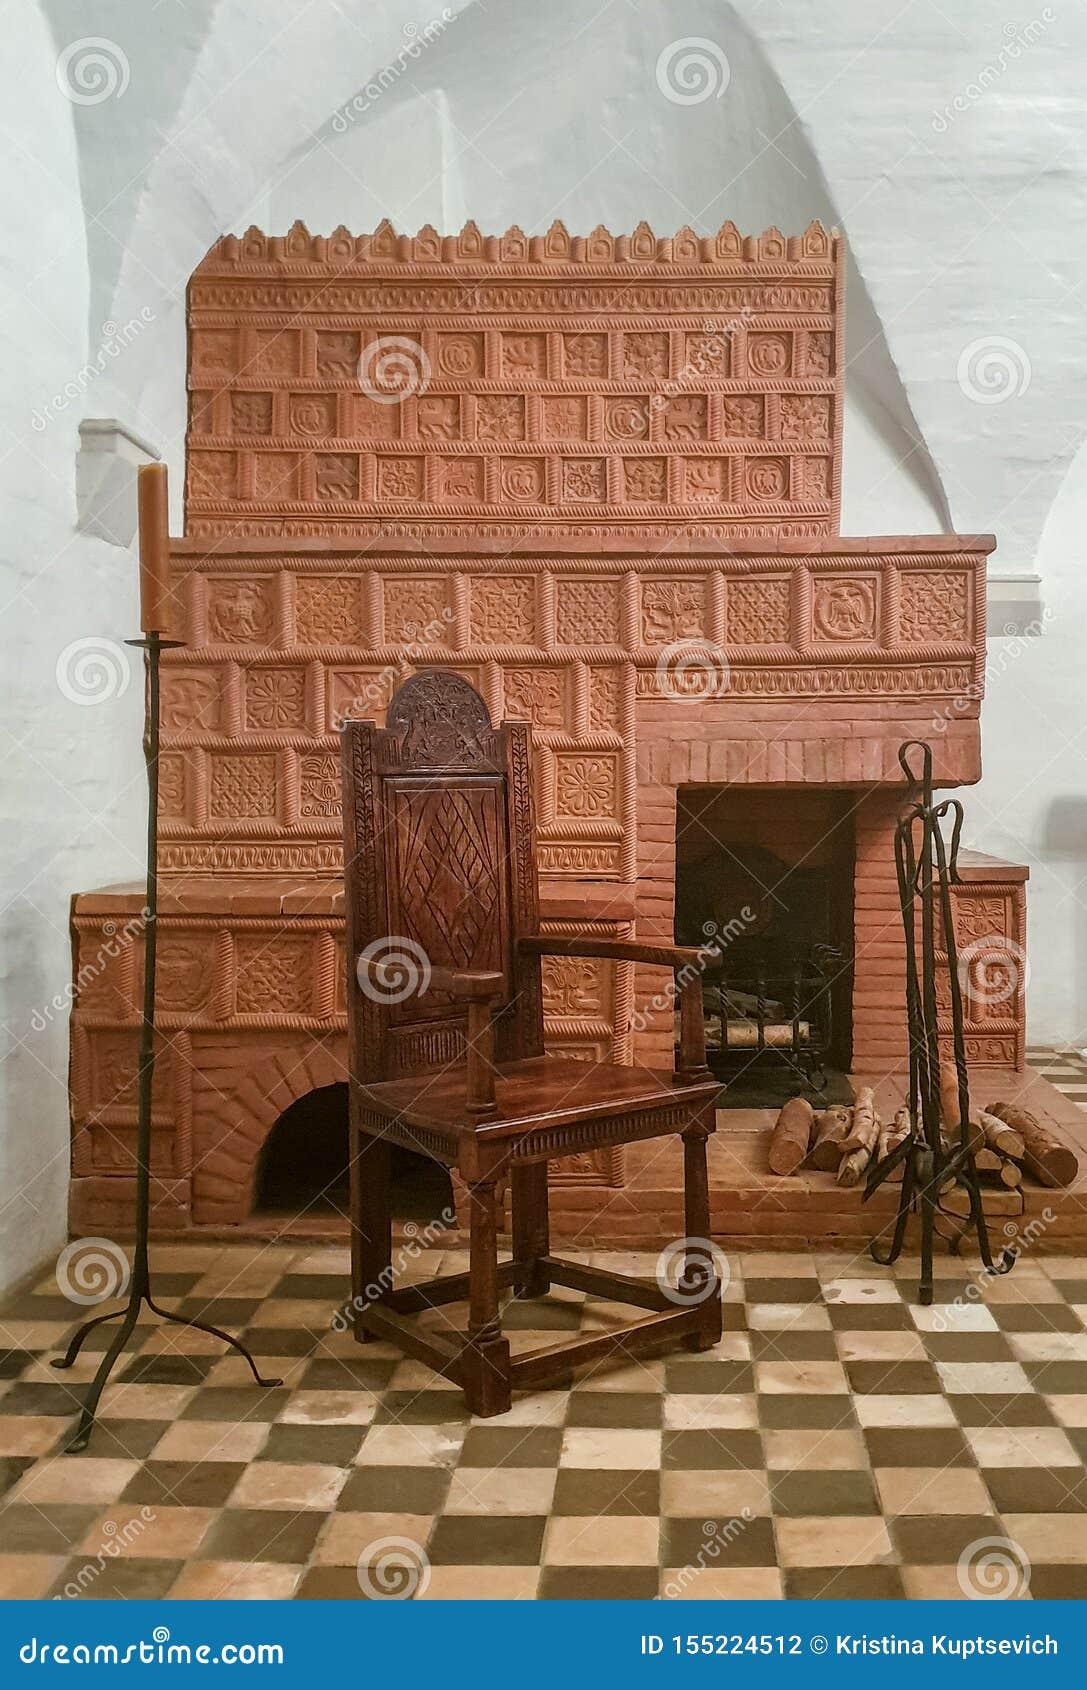 R 俄罗斯- 2019年5月12日:与一把木椅子、蜡烛和一个壁炉的地道历史中世纪内部与瓦片